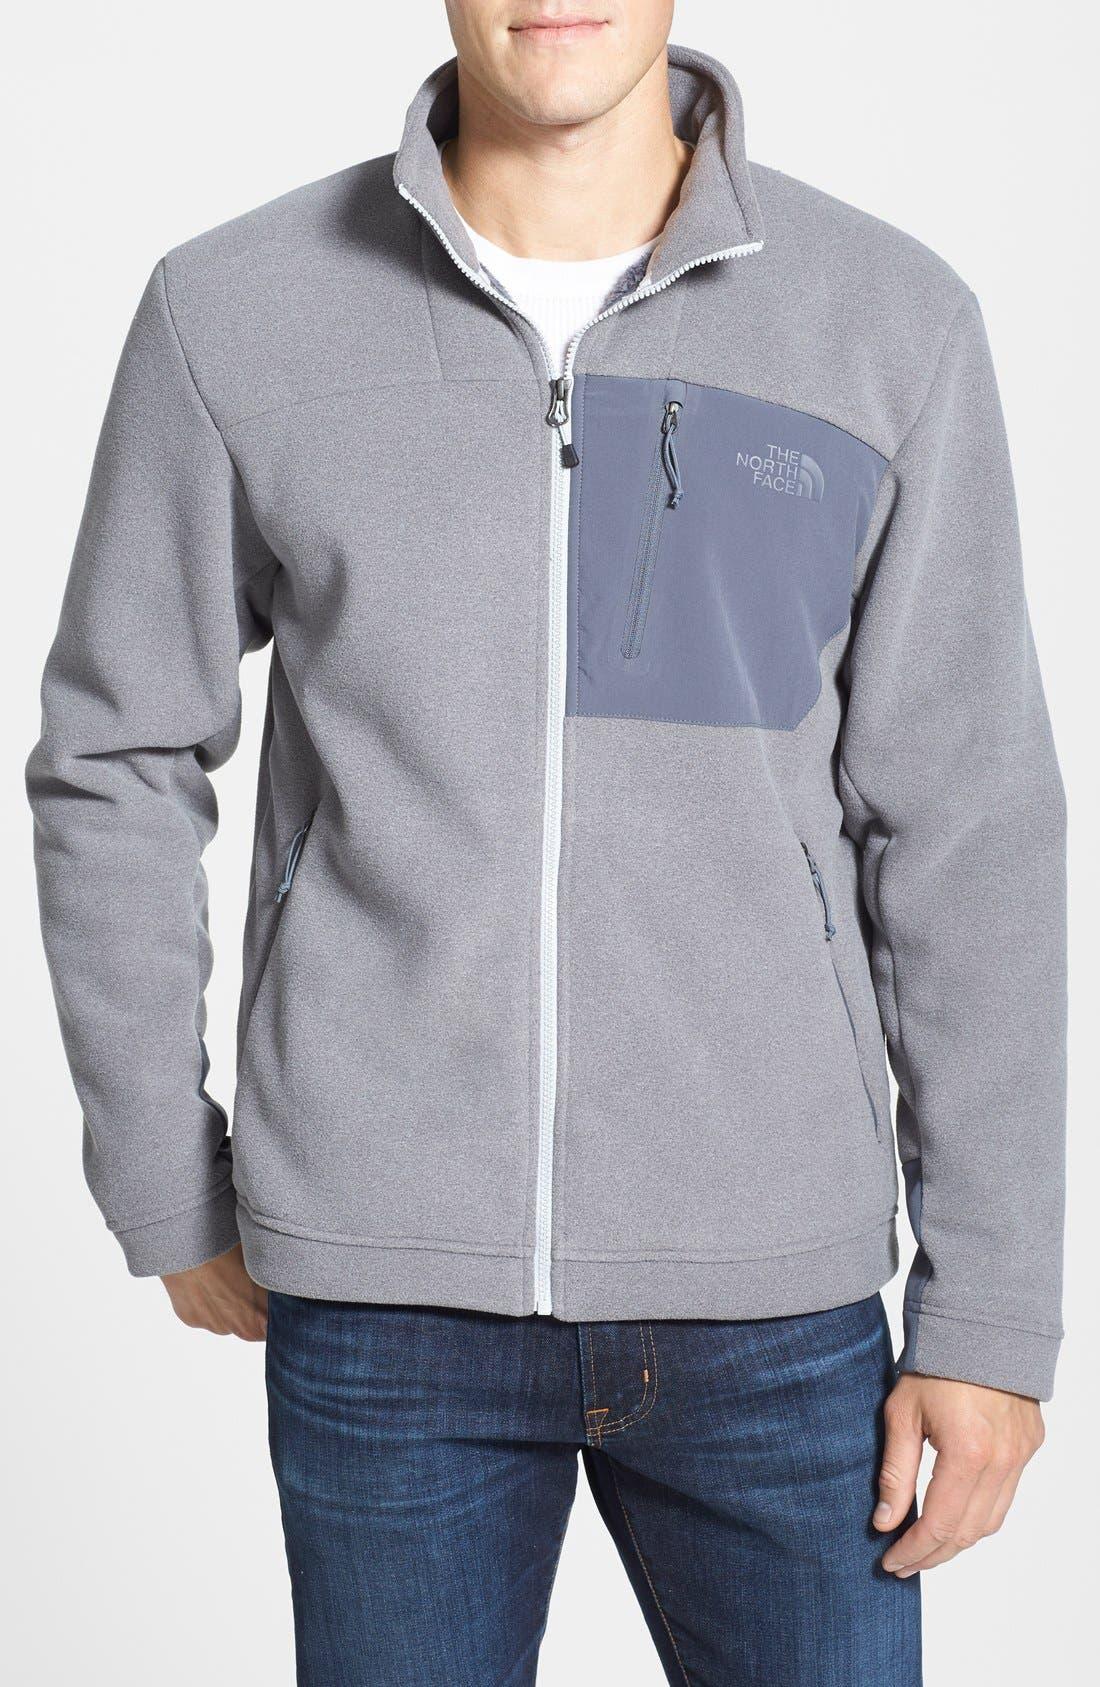 Alternate Image 1 Selected - The North Face 'Chimborazo' Zip Front Fleece Jacket